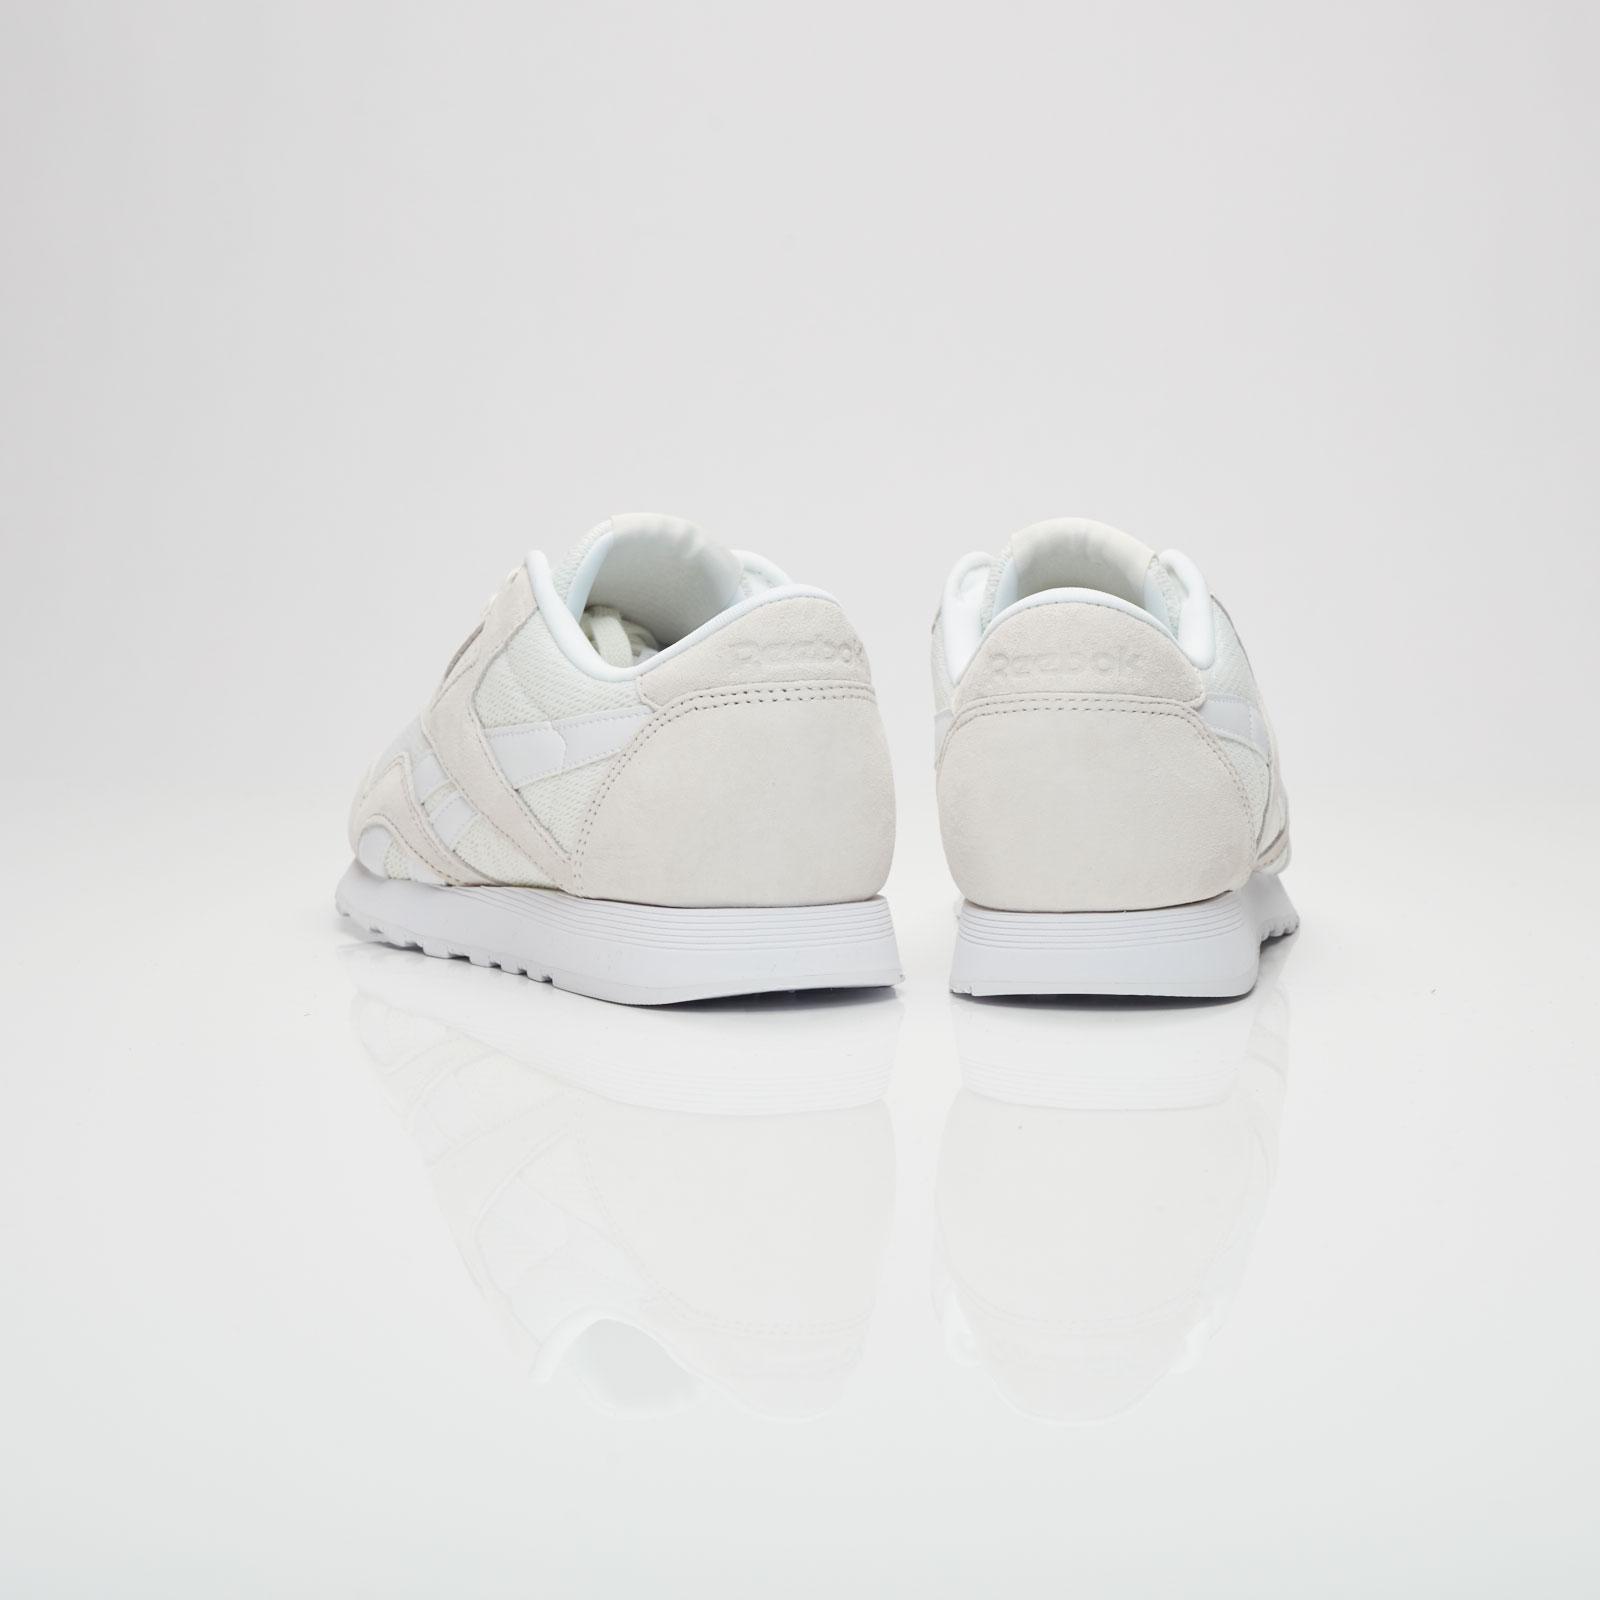 828232dad36 Reebok Classic Nylon Sail Away - Bd3377 - Sneakersnstuff